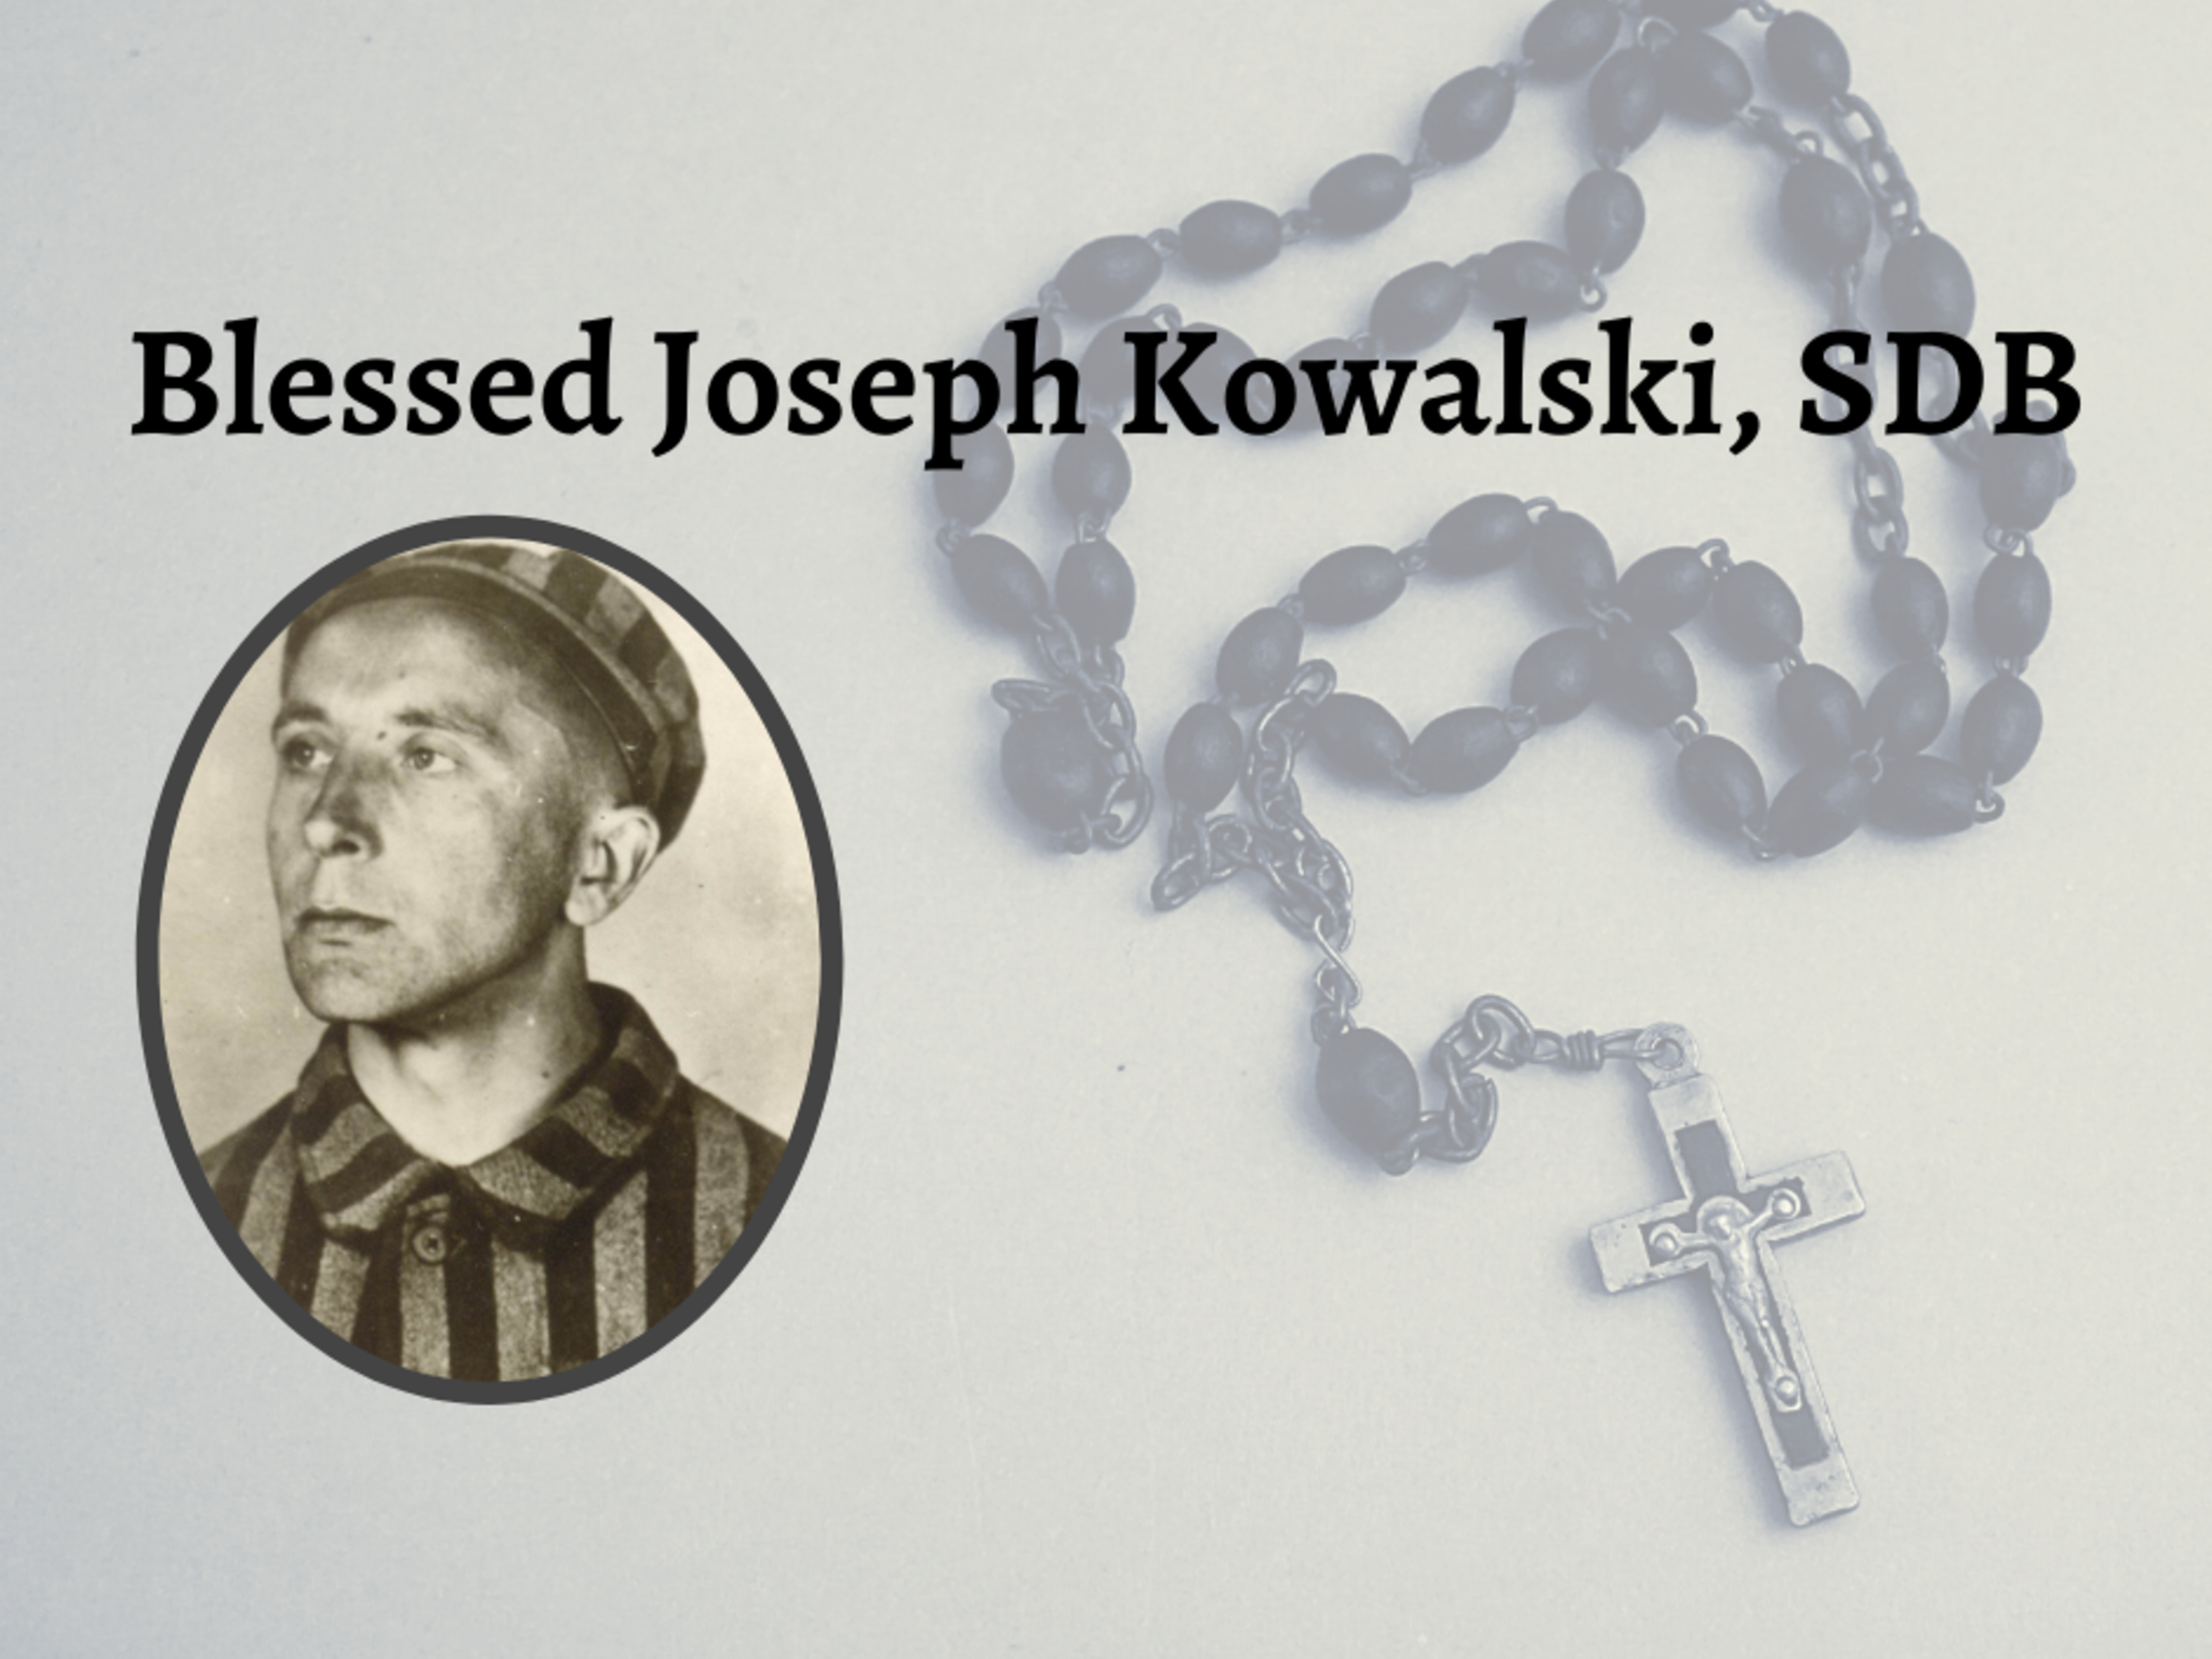 Blessed Joseph Kowalski